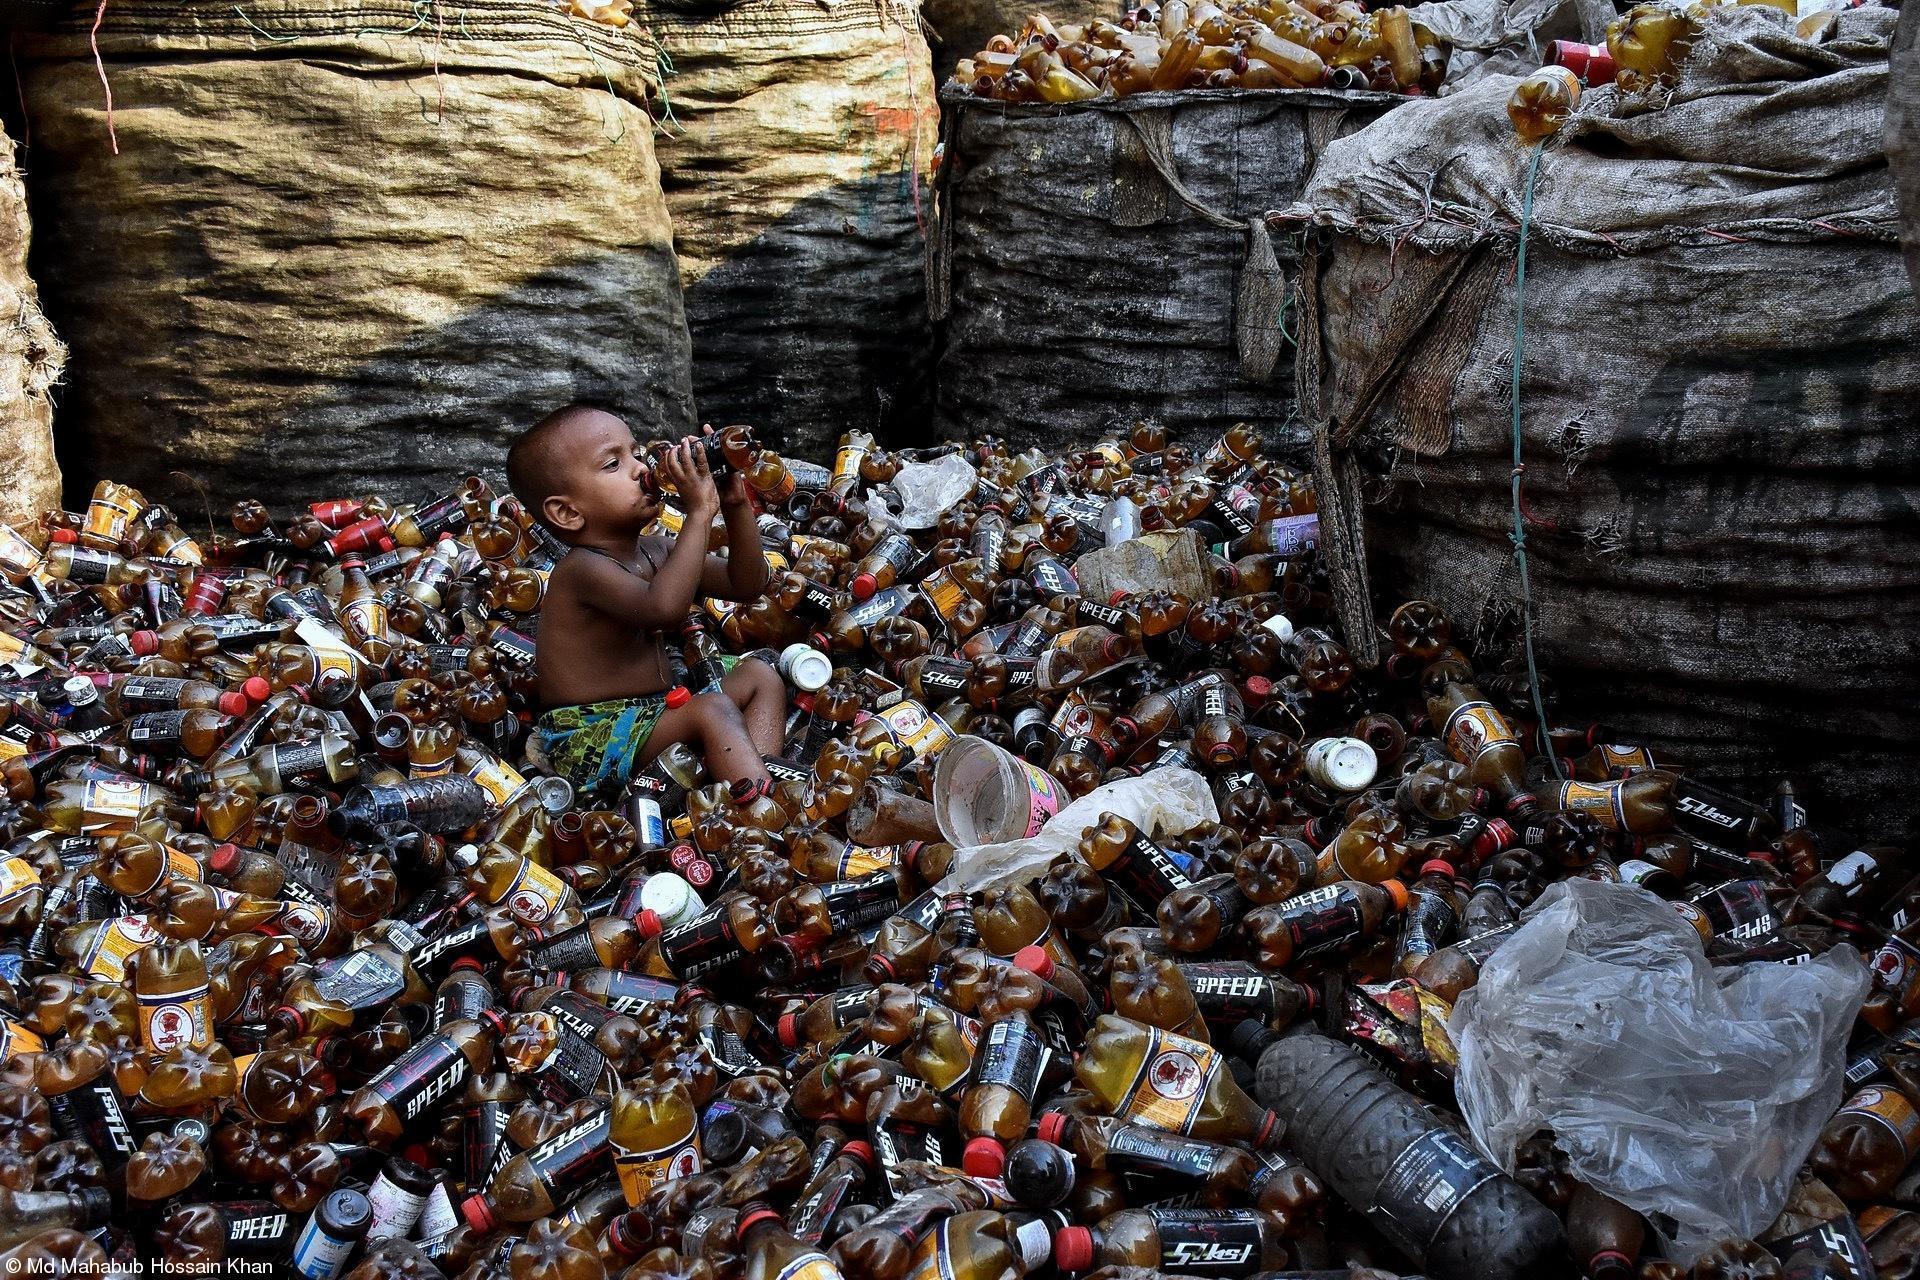 Life - Md Mahabub Hossain Khan - Drinking from Garbage